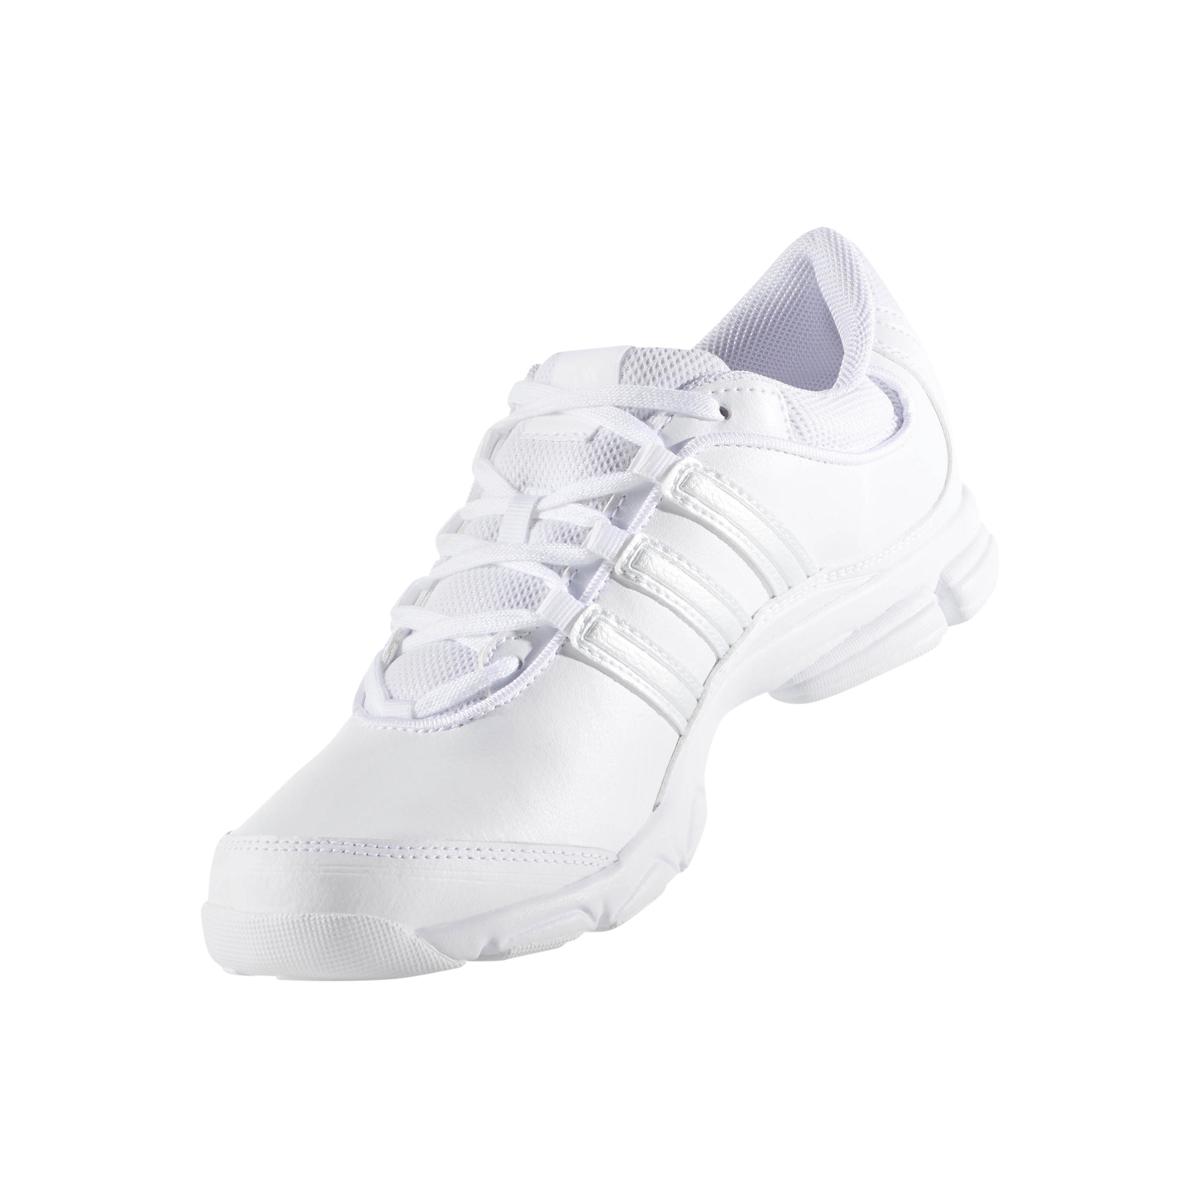 Adidas Cheer Sport Cheer Shoe   High